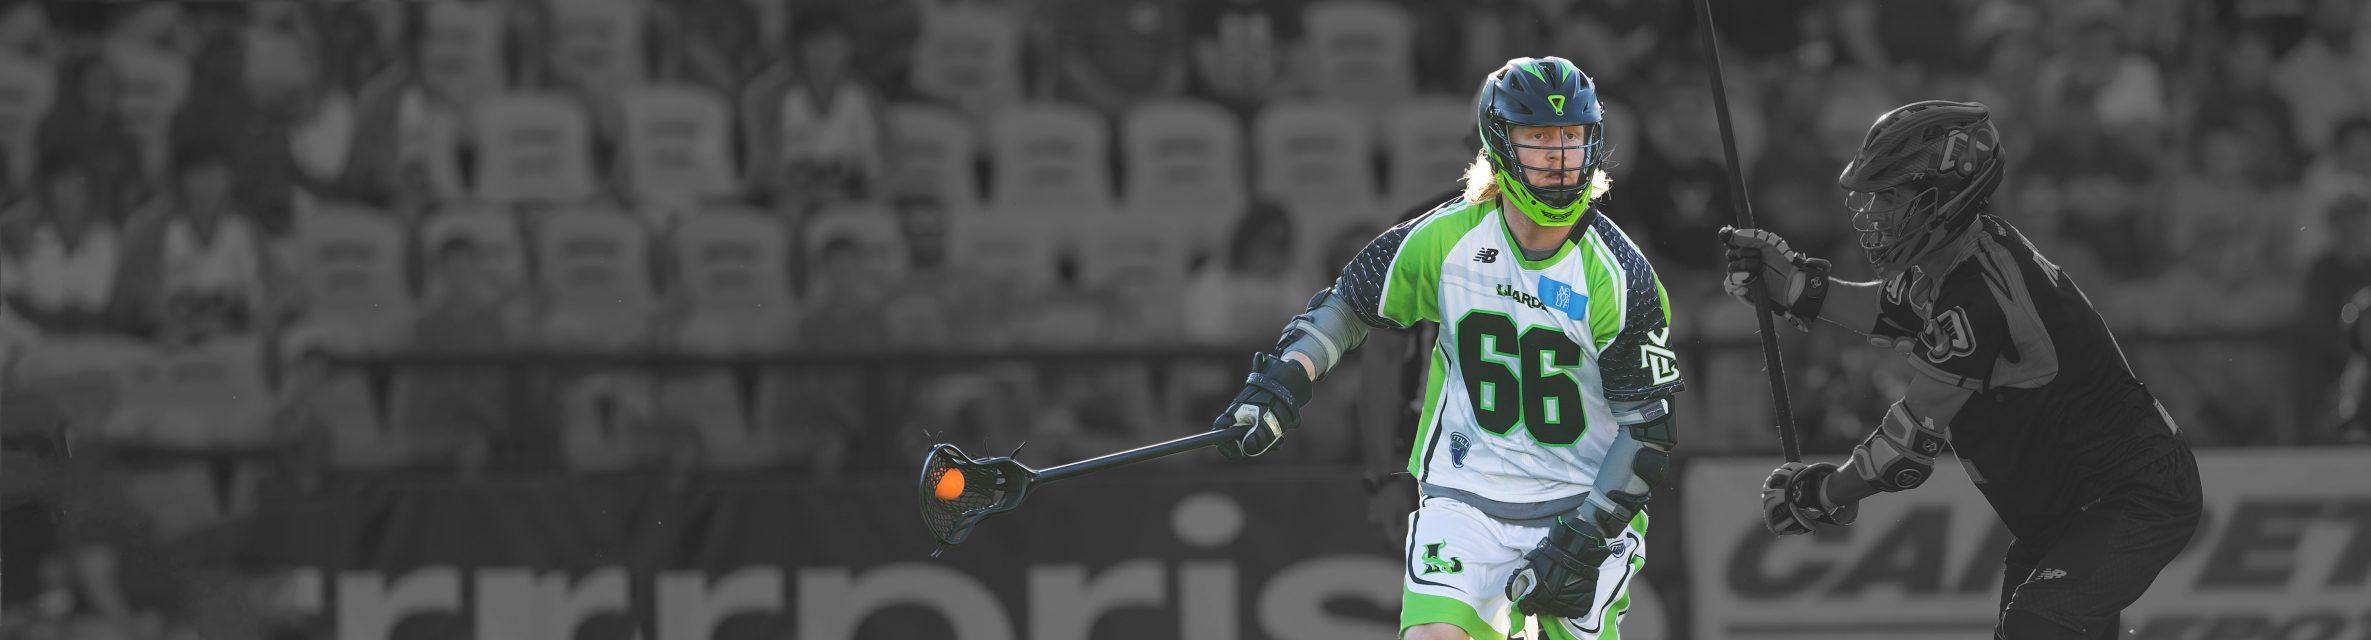 StringKing Matt Gibson Pro Series Lacrosse Stick In Action